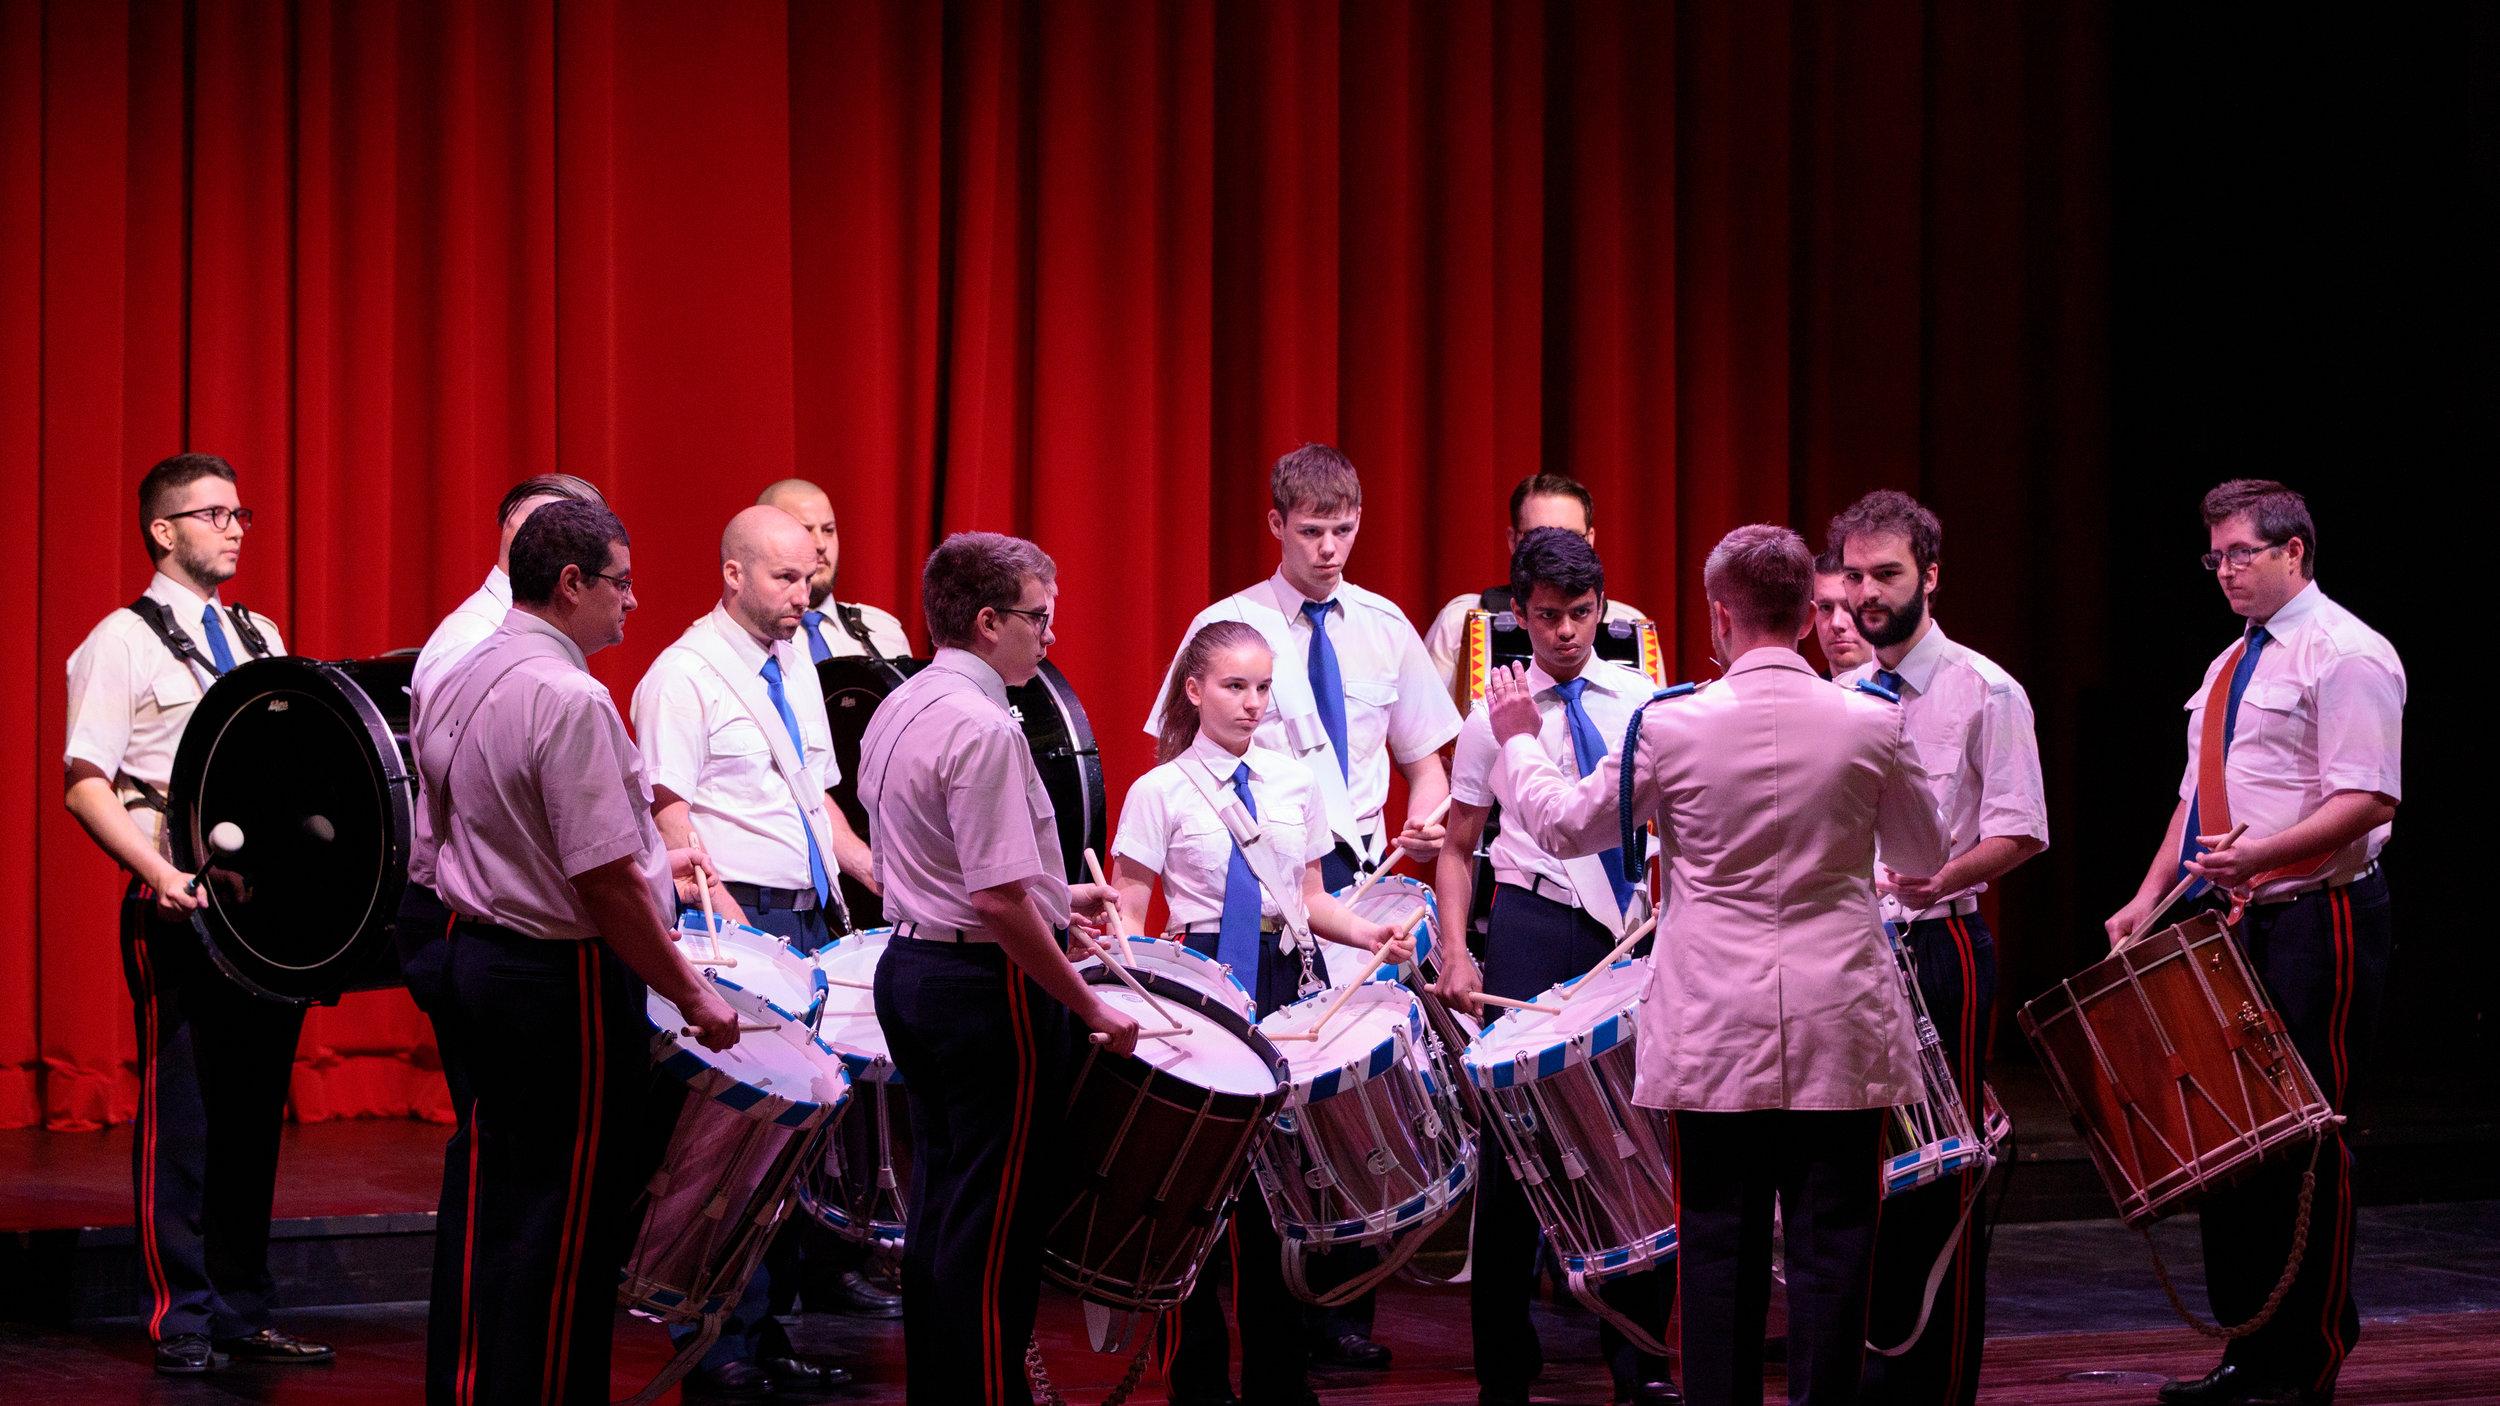 2019-05-25-concours-cantonal-tambours-acmg-1149_47931872083_o.jpg